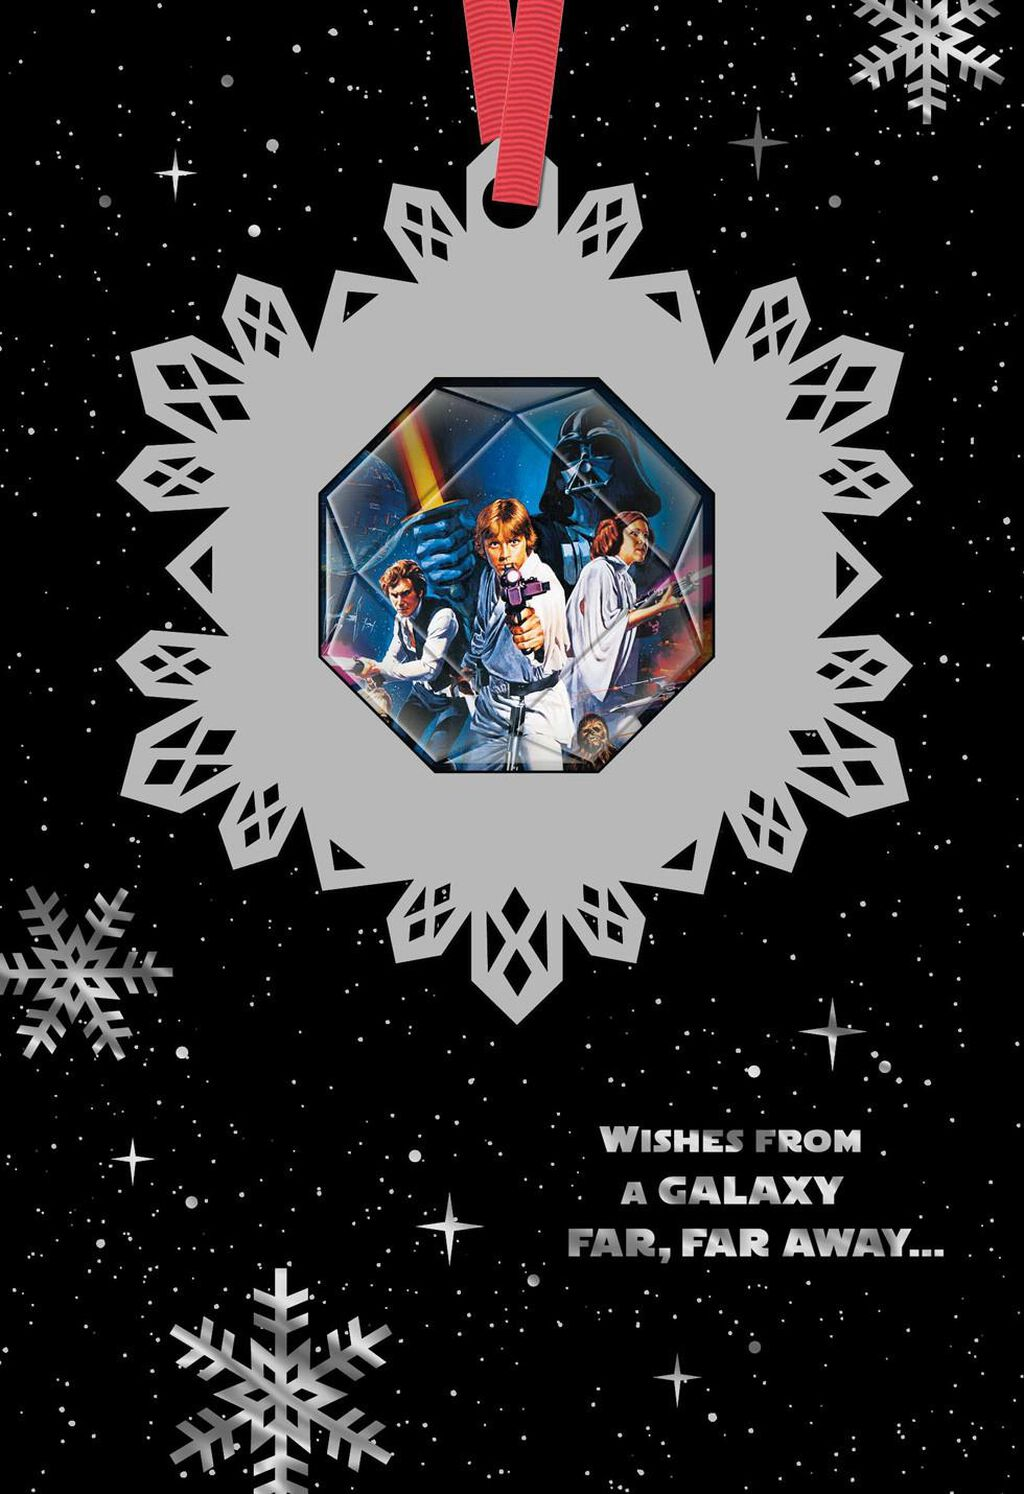 Star Wars Seasons Greetings Christmas Card With Ornament